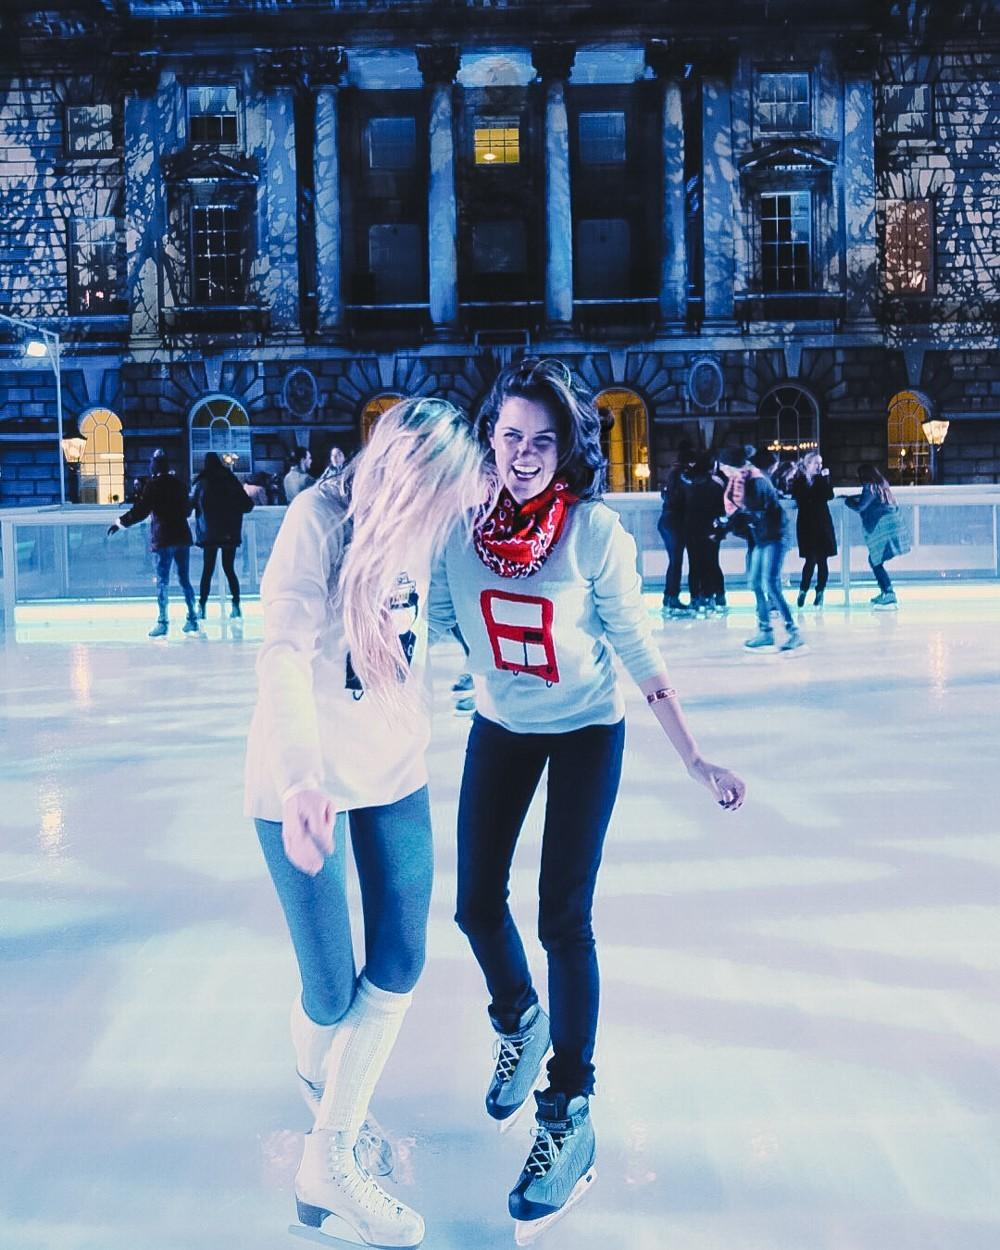 Christmas skating!